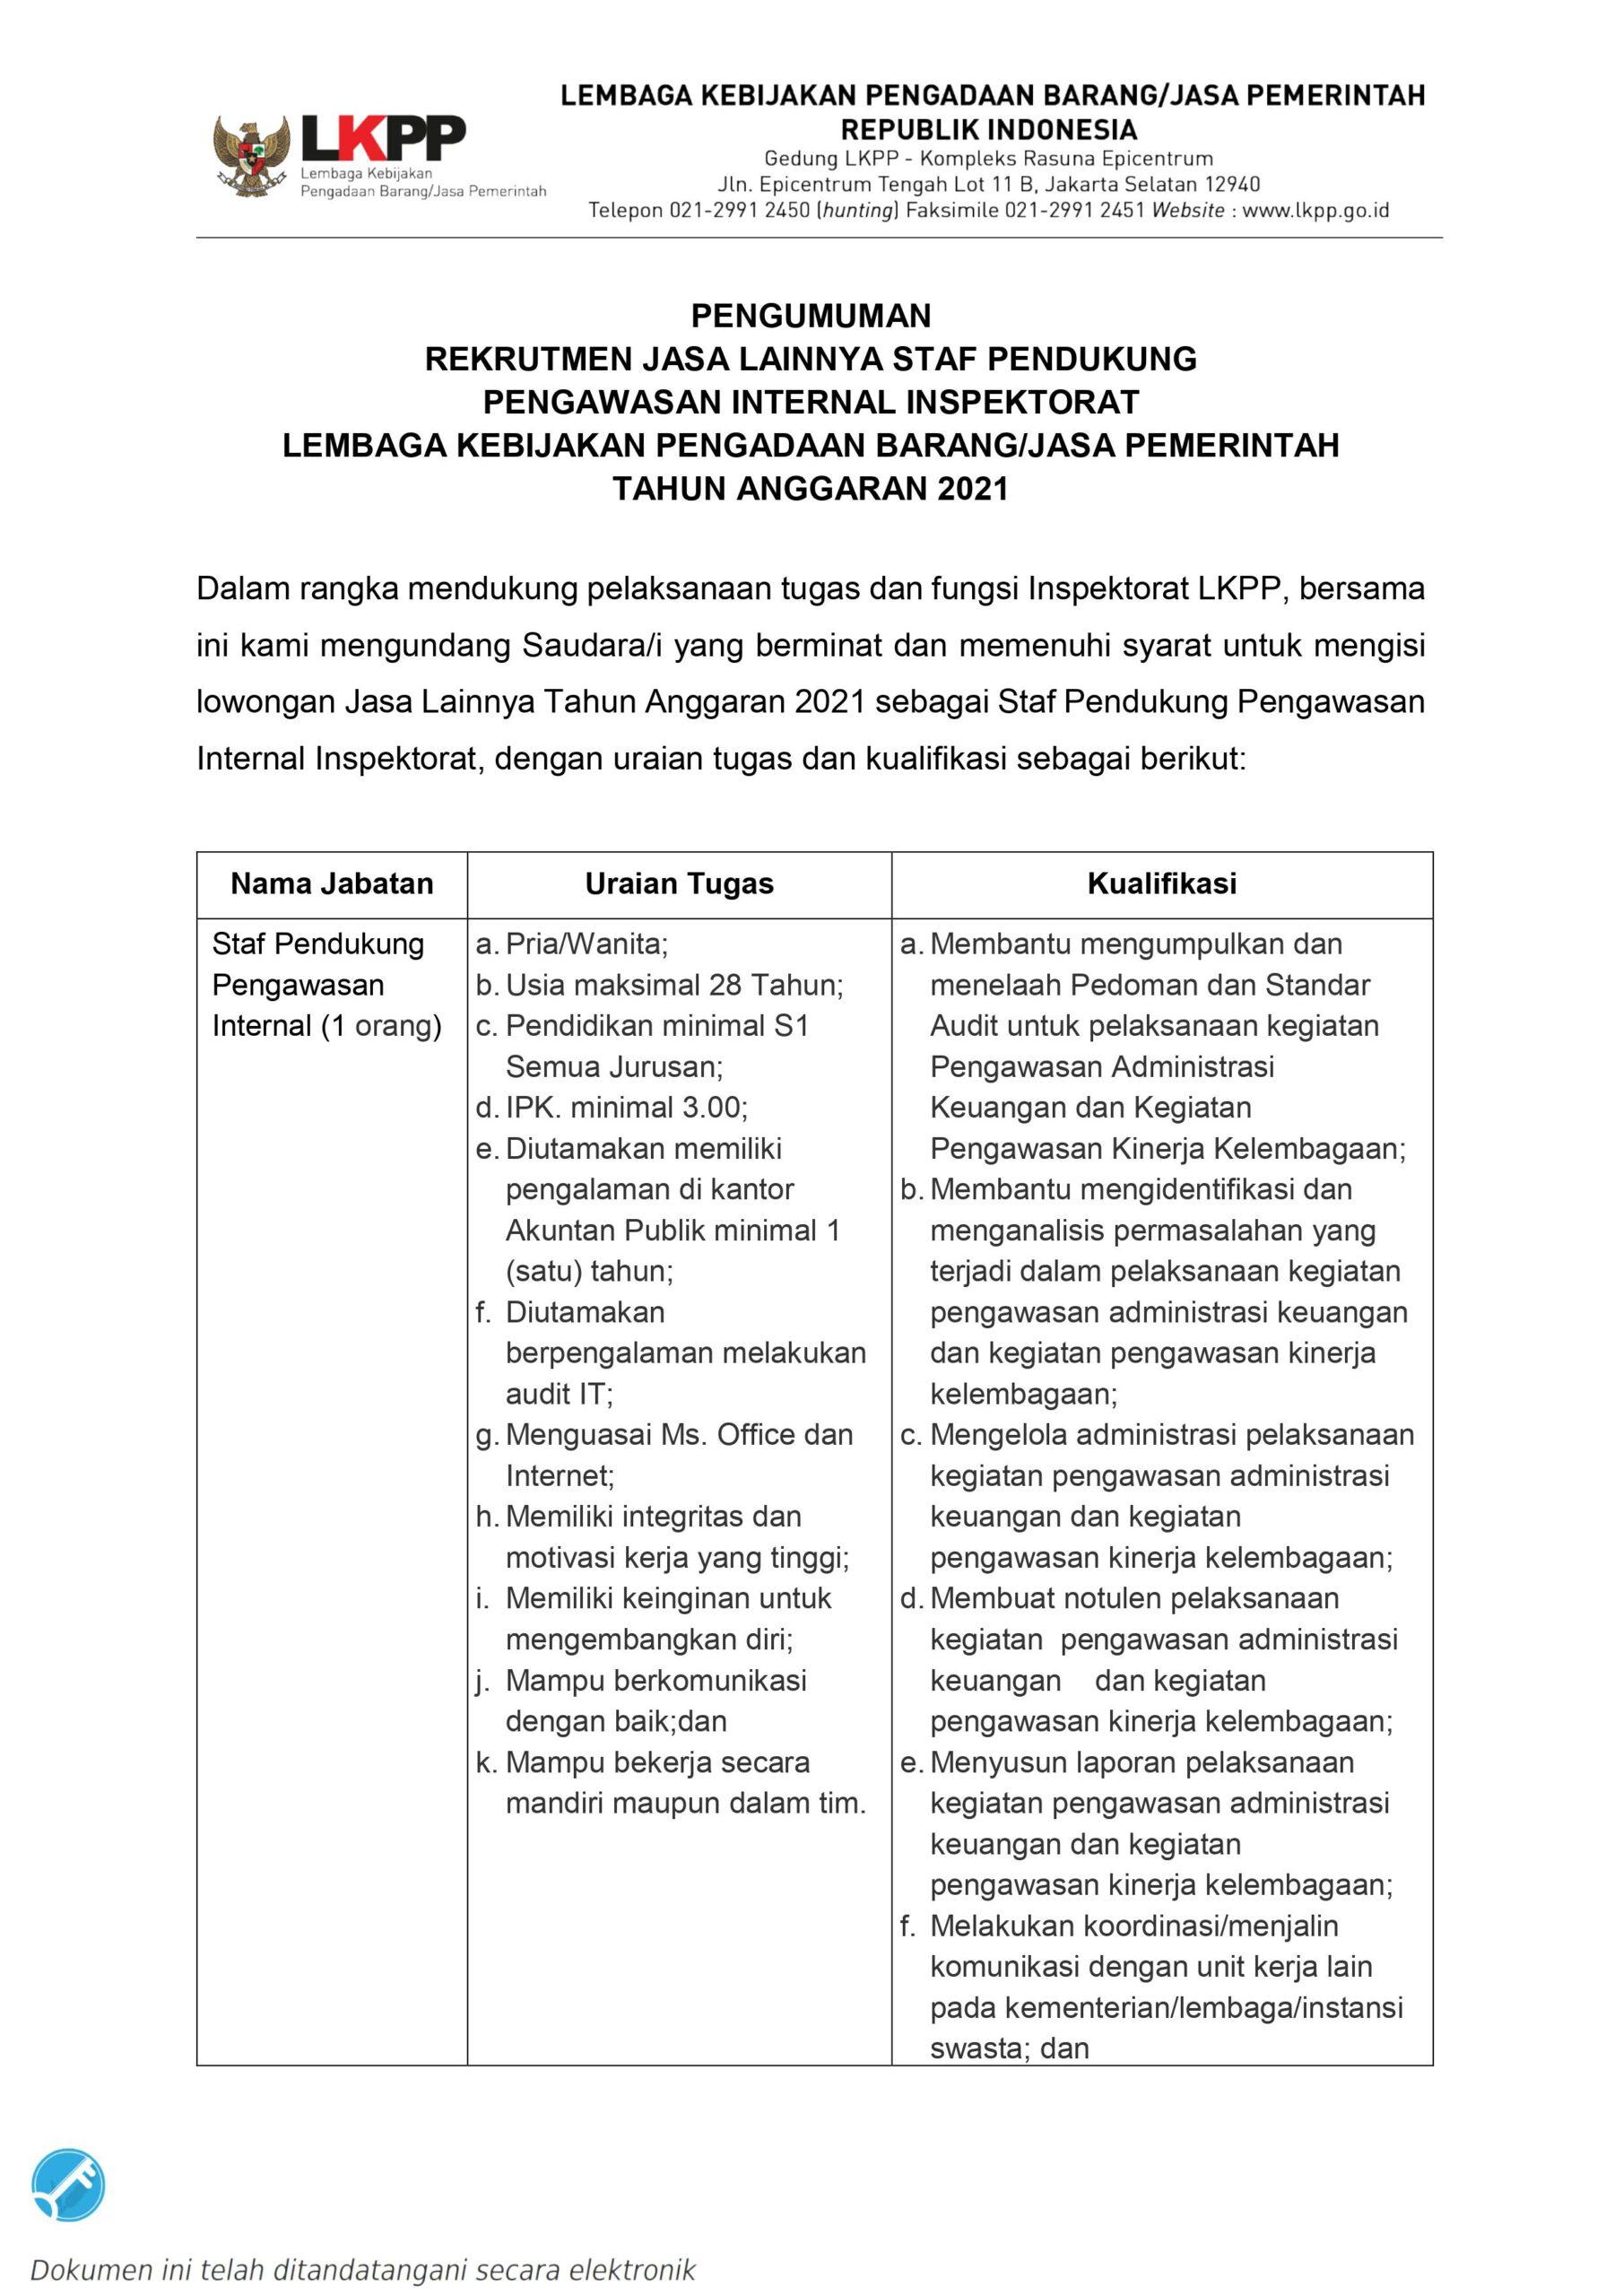 Penerimaan Staf Pendukung Pengawasan Internal Inspektorat LKPP